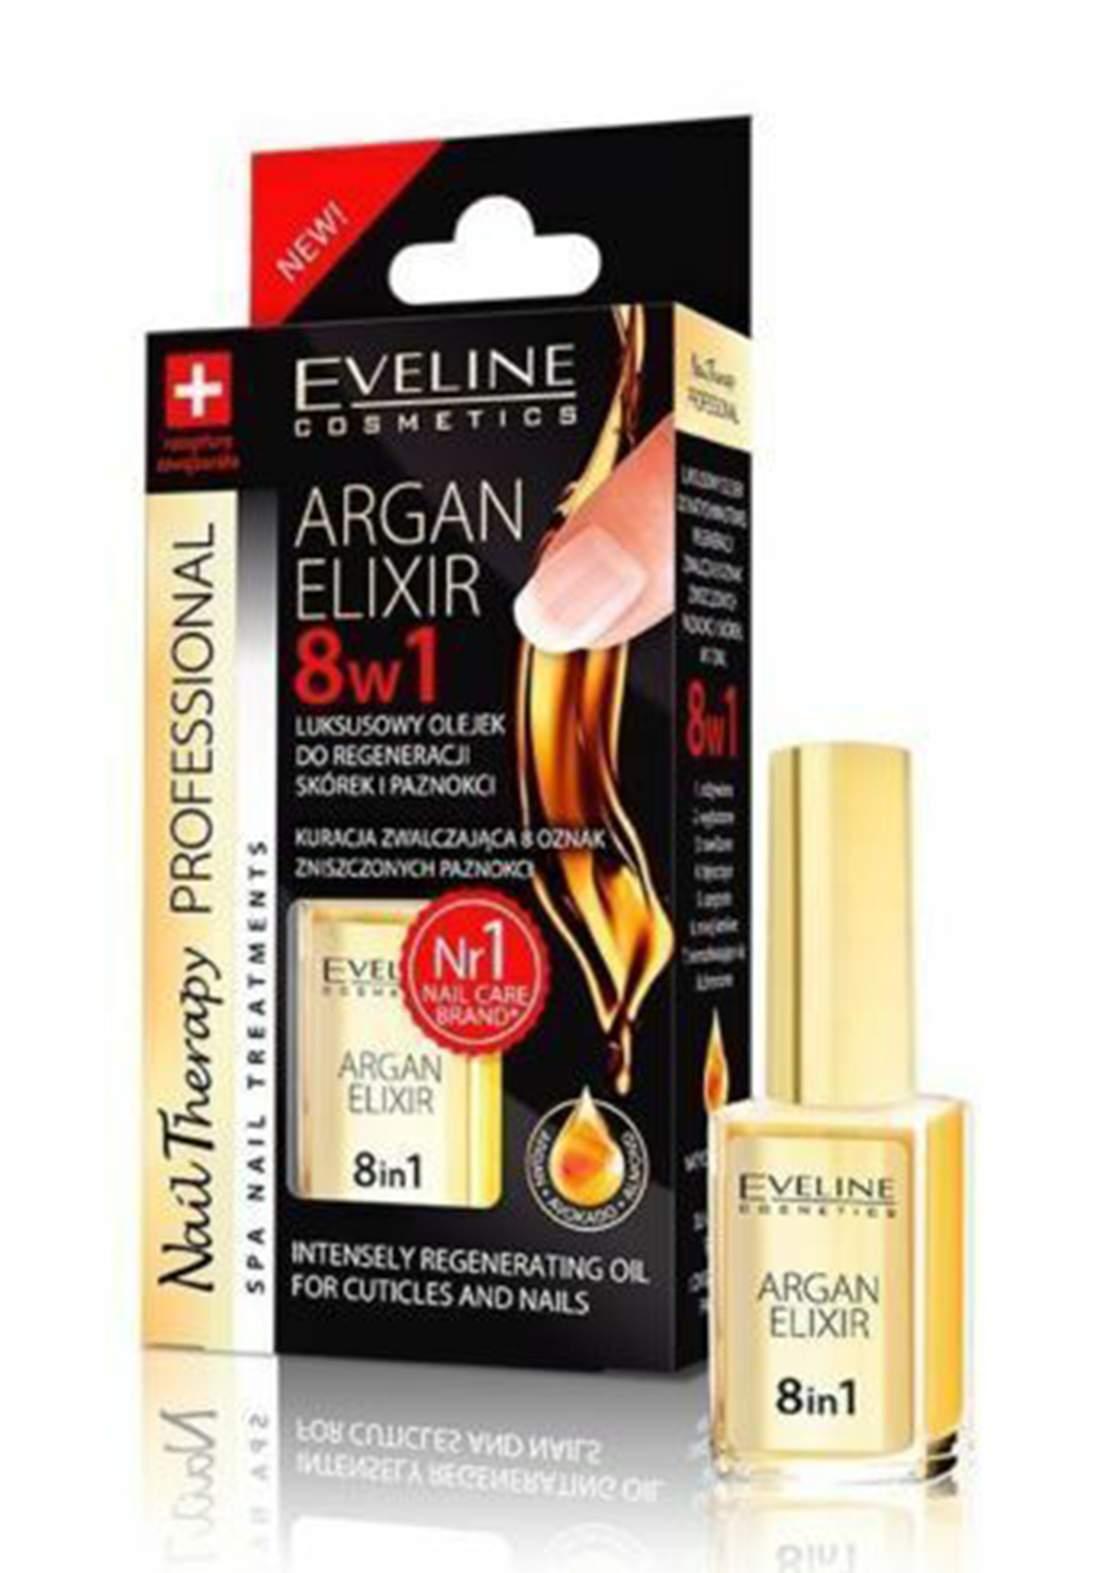 (095-0026)Eveline Nail Therapy Argan Elixir 8 w 1 Professional Nail Conditioner 12ml معالج للأظافر